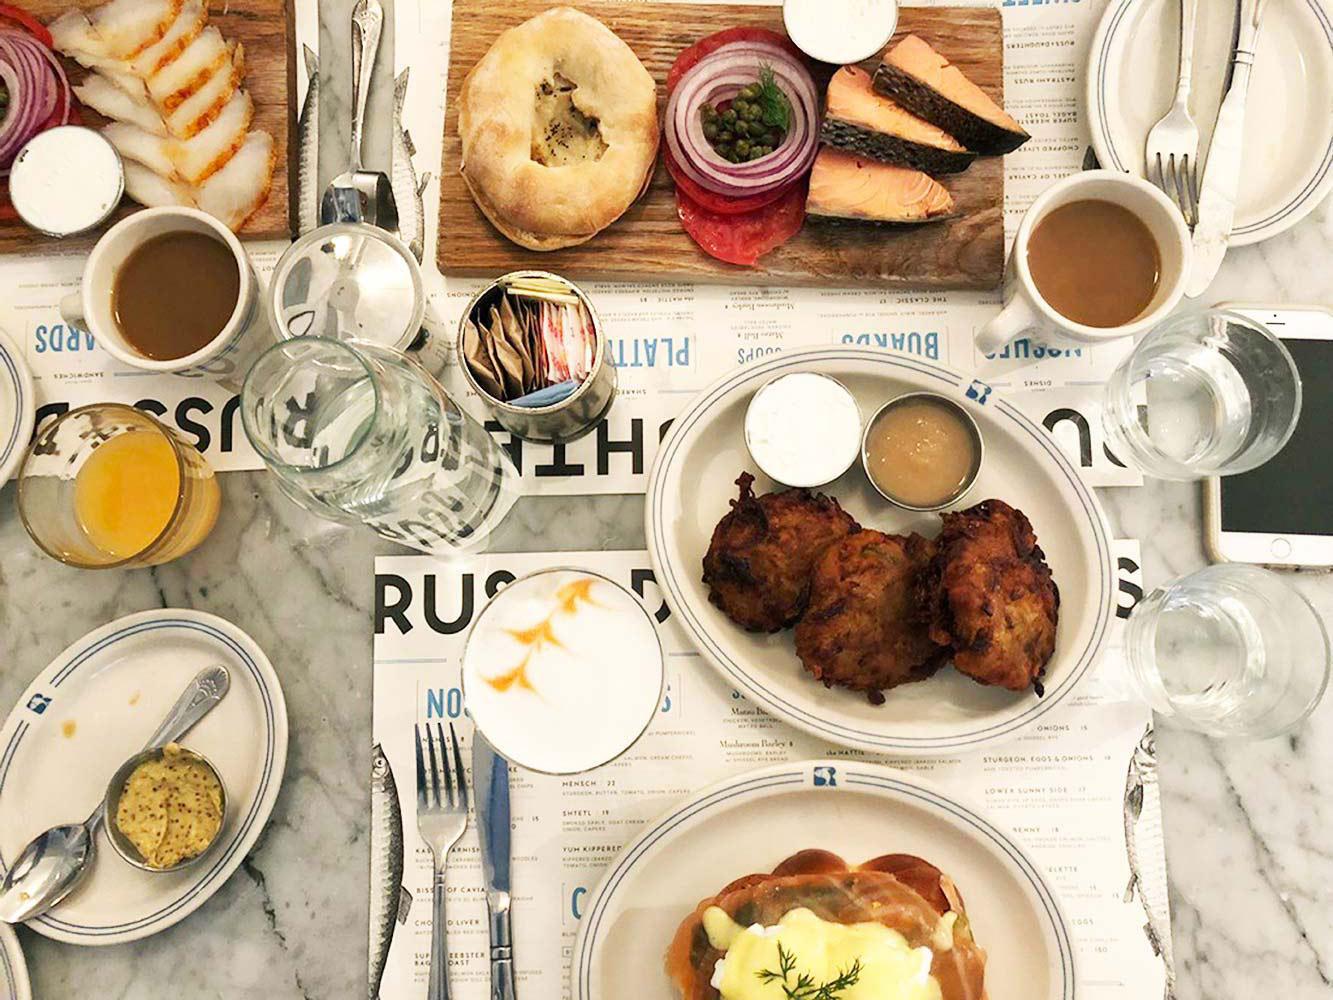 Food Tour of New York